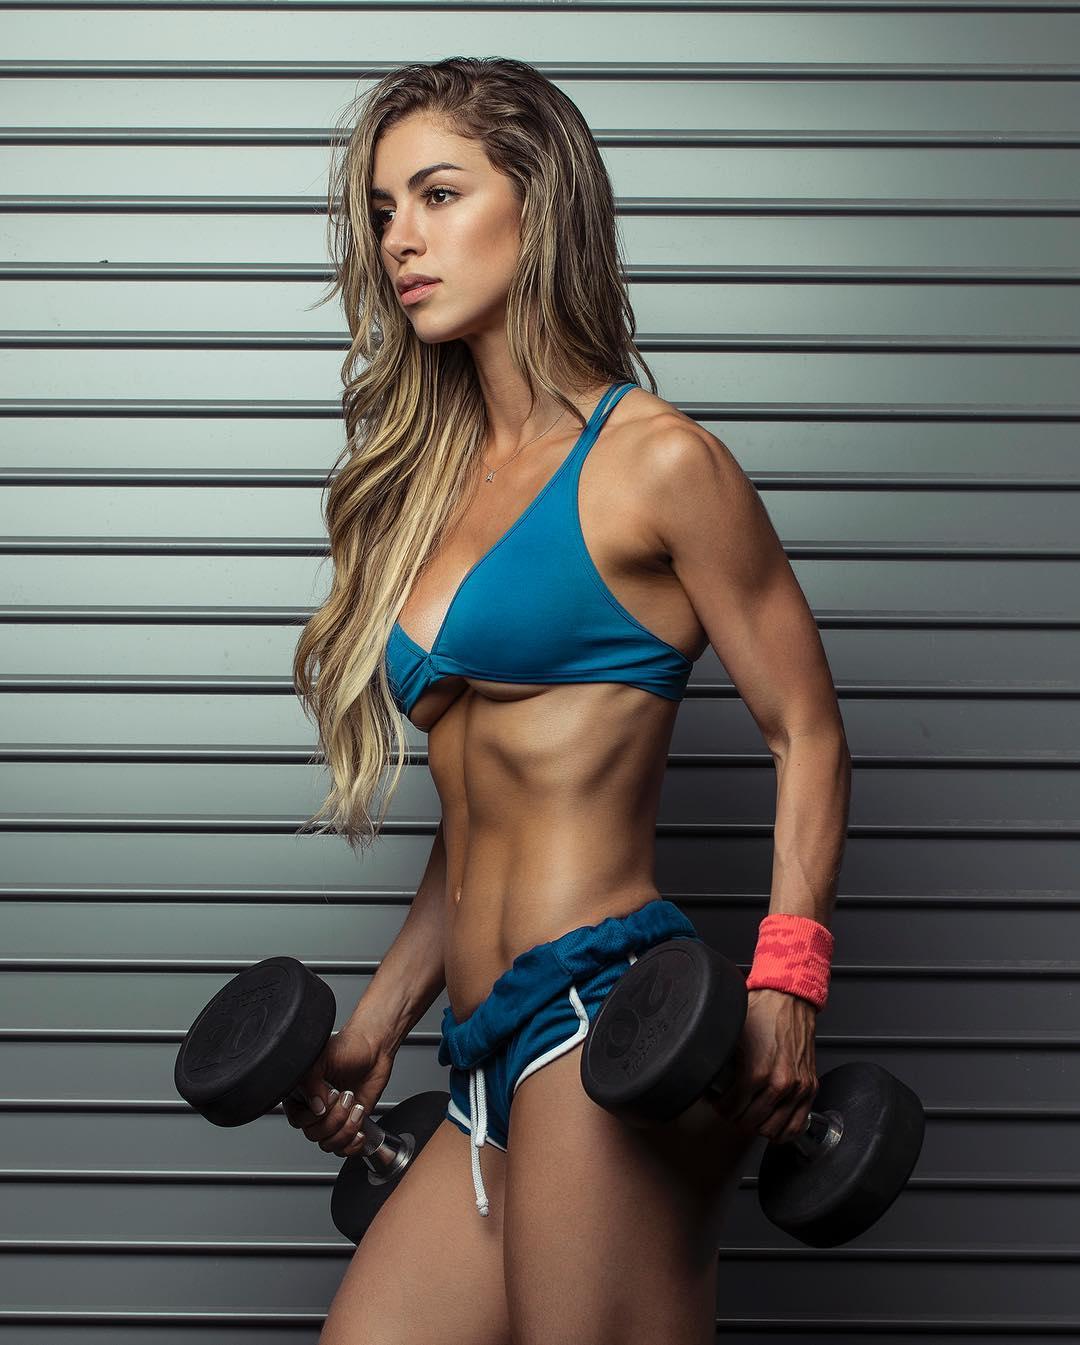 Anllela Sagra - anllela_sagra - The Fitness Girlz